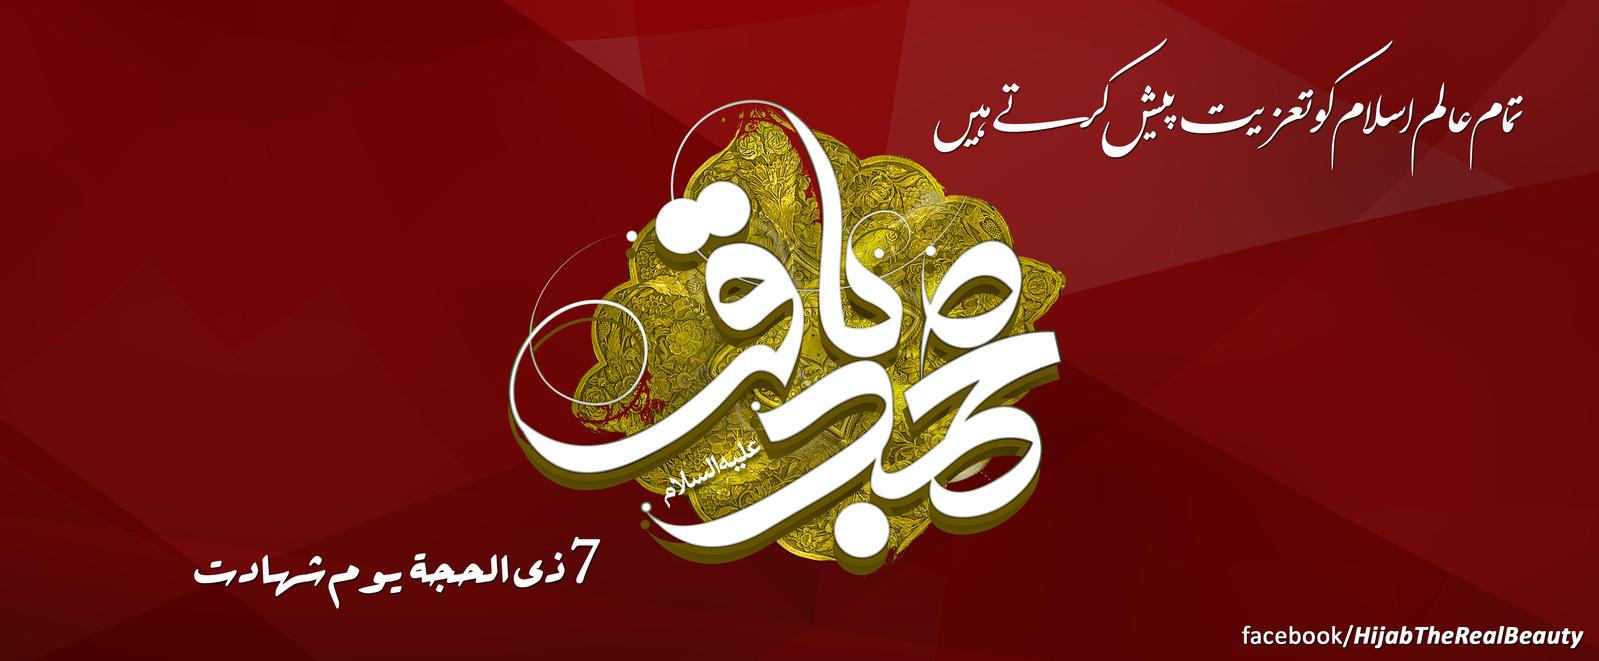 Shahadat Imam Muhammad Bin Ali Al-Baqir AS by